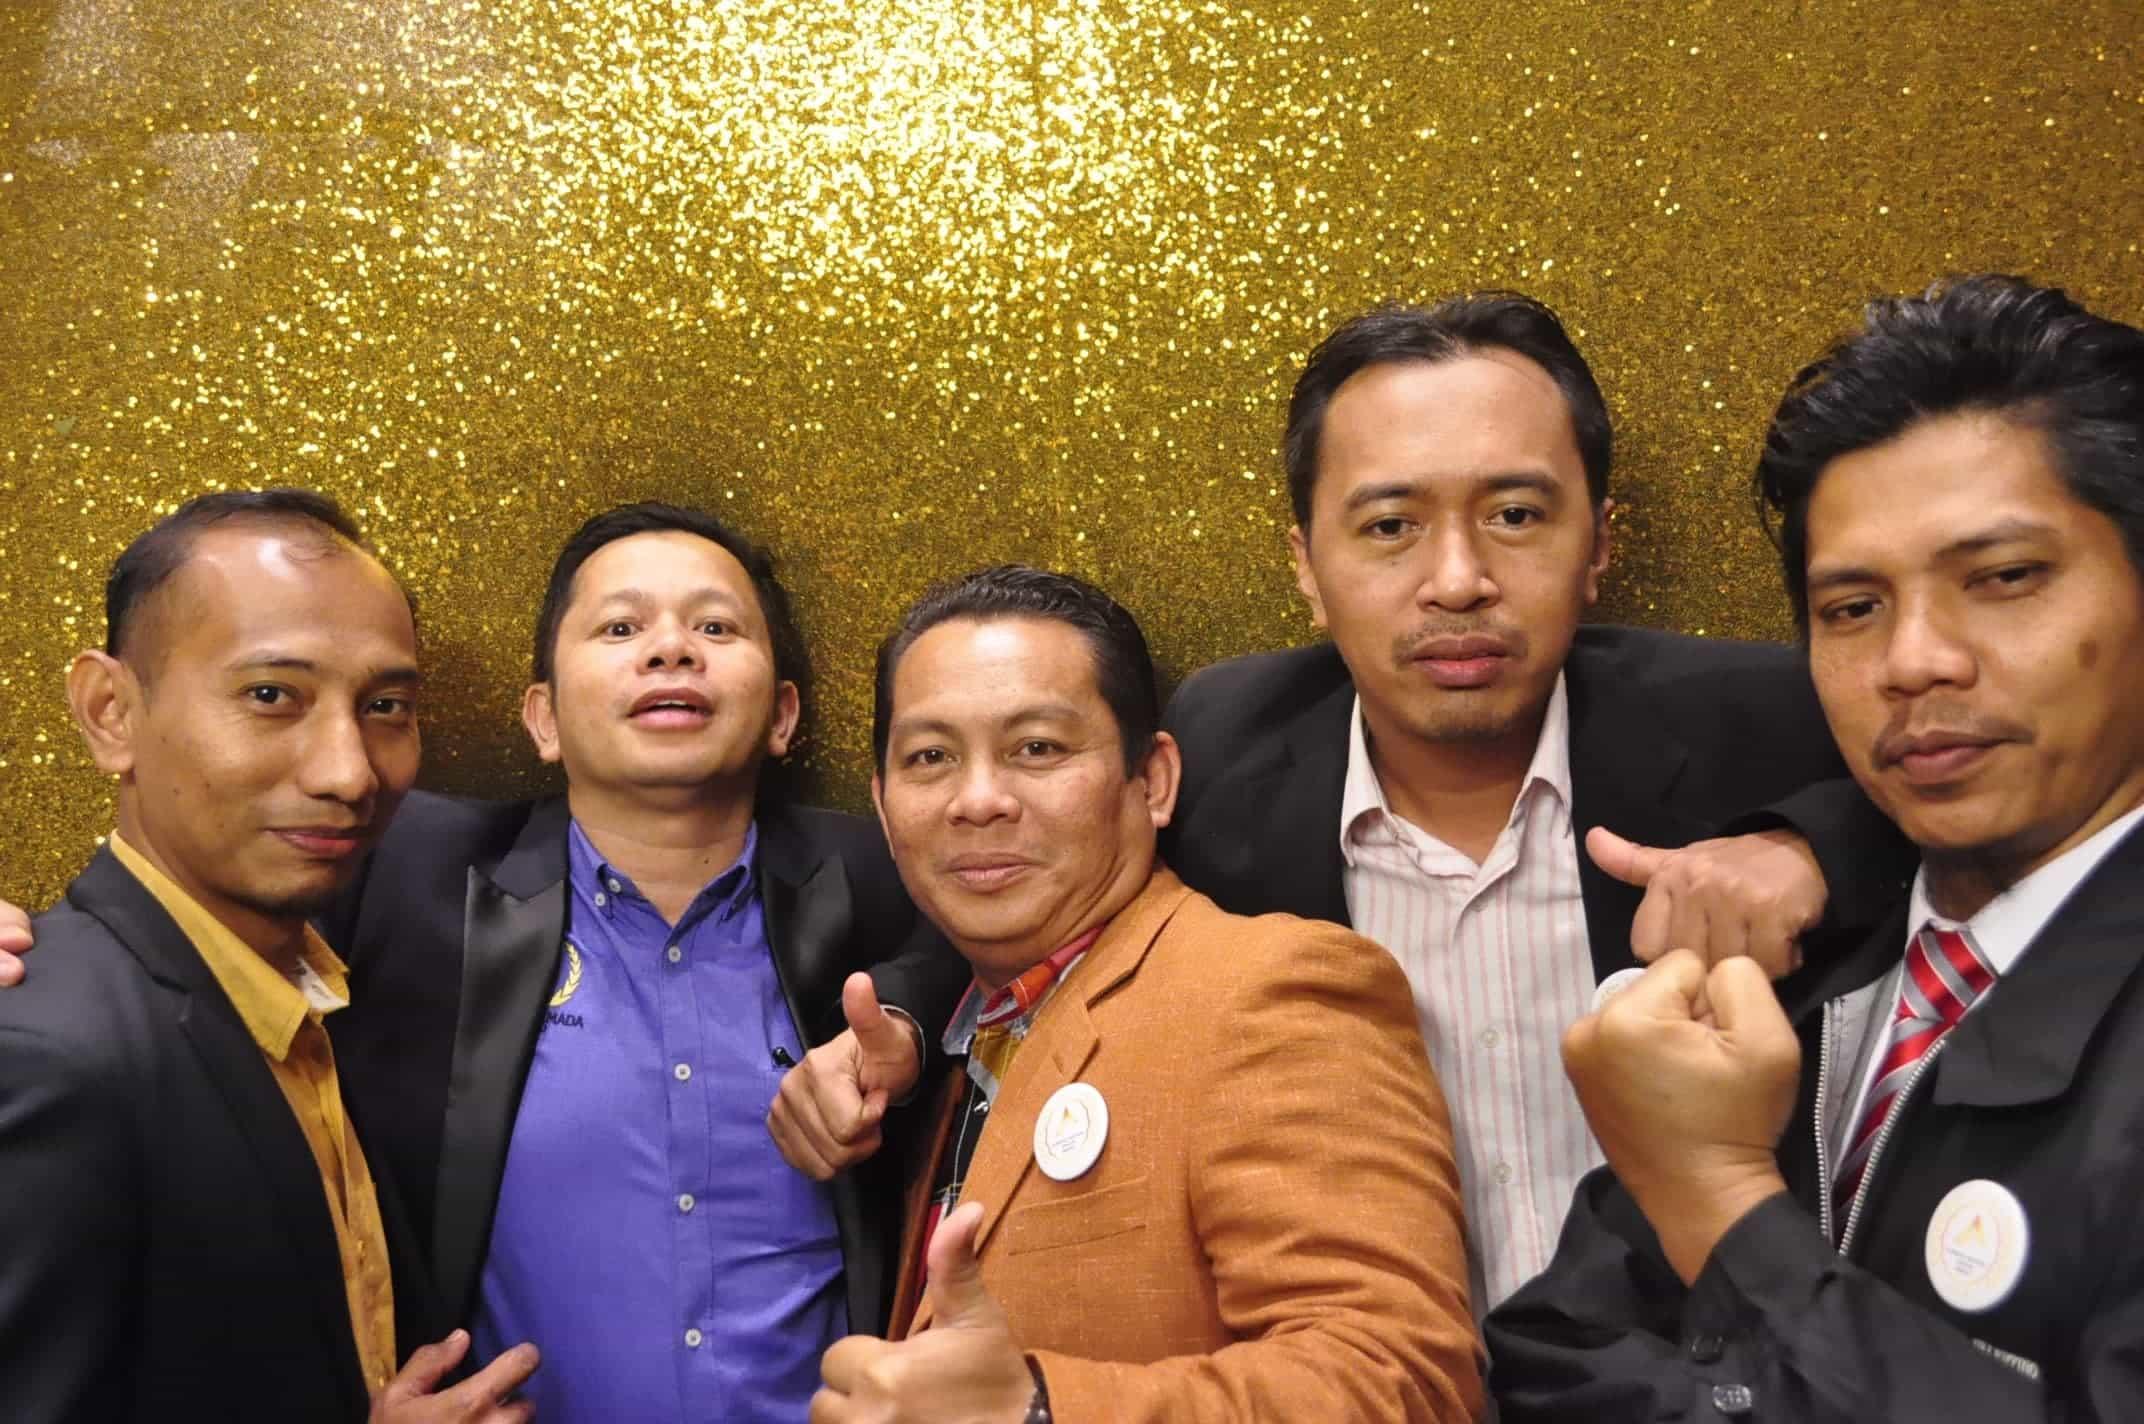 Malam Gala Anggun 2018 (Photobooth) 9